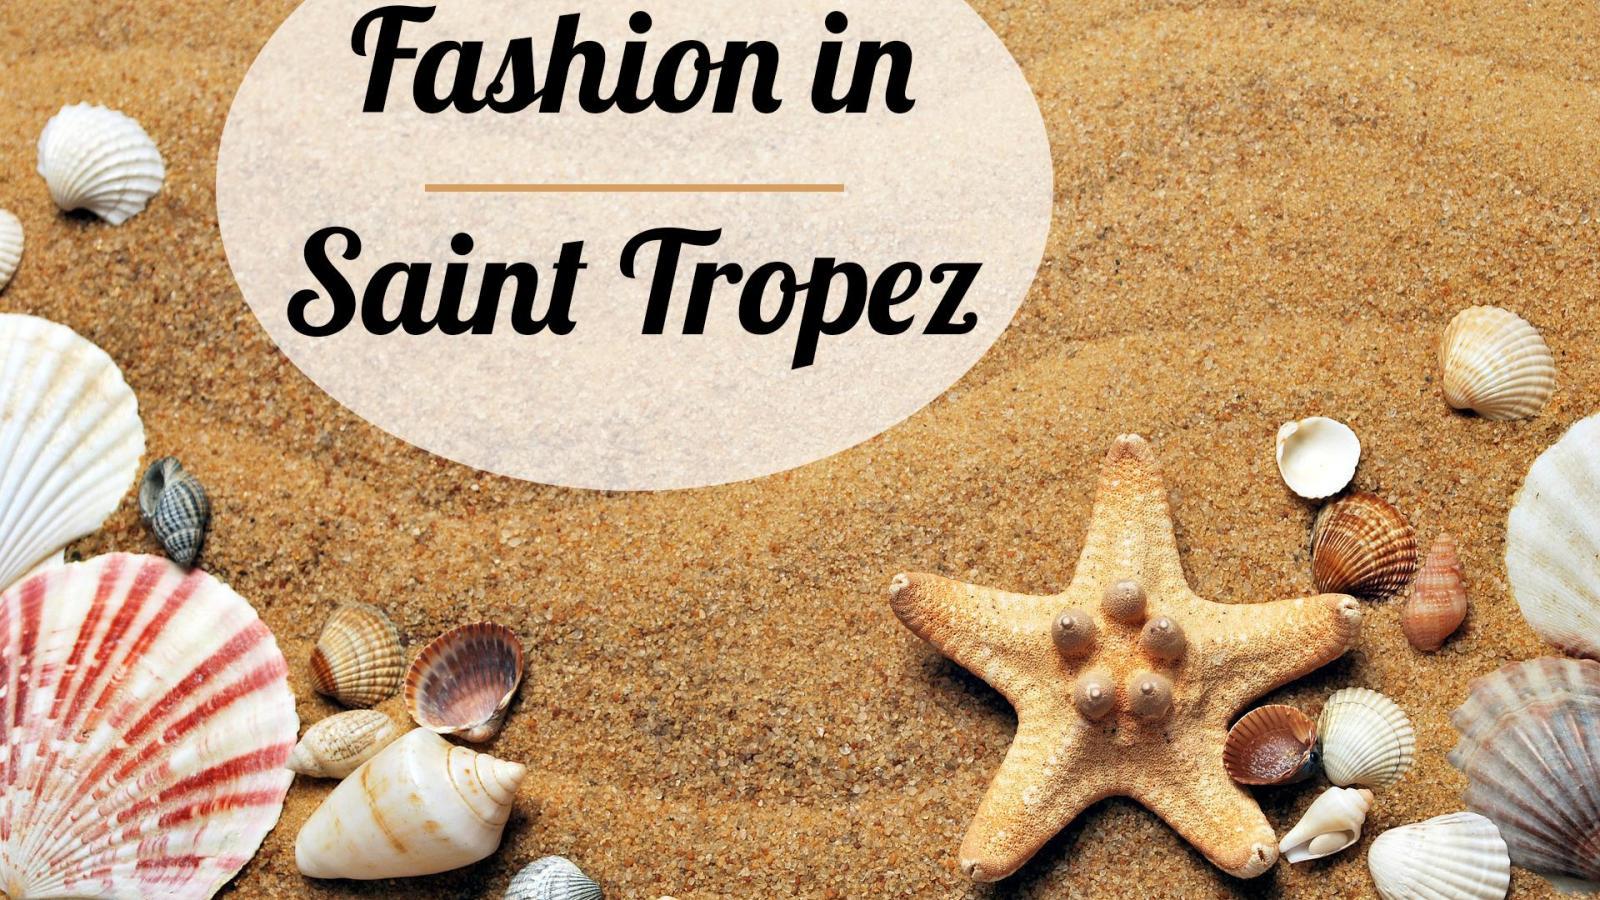 Saint-Tropez: Summer fashion capital